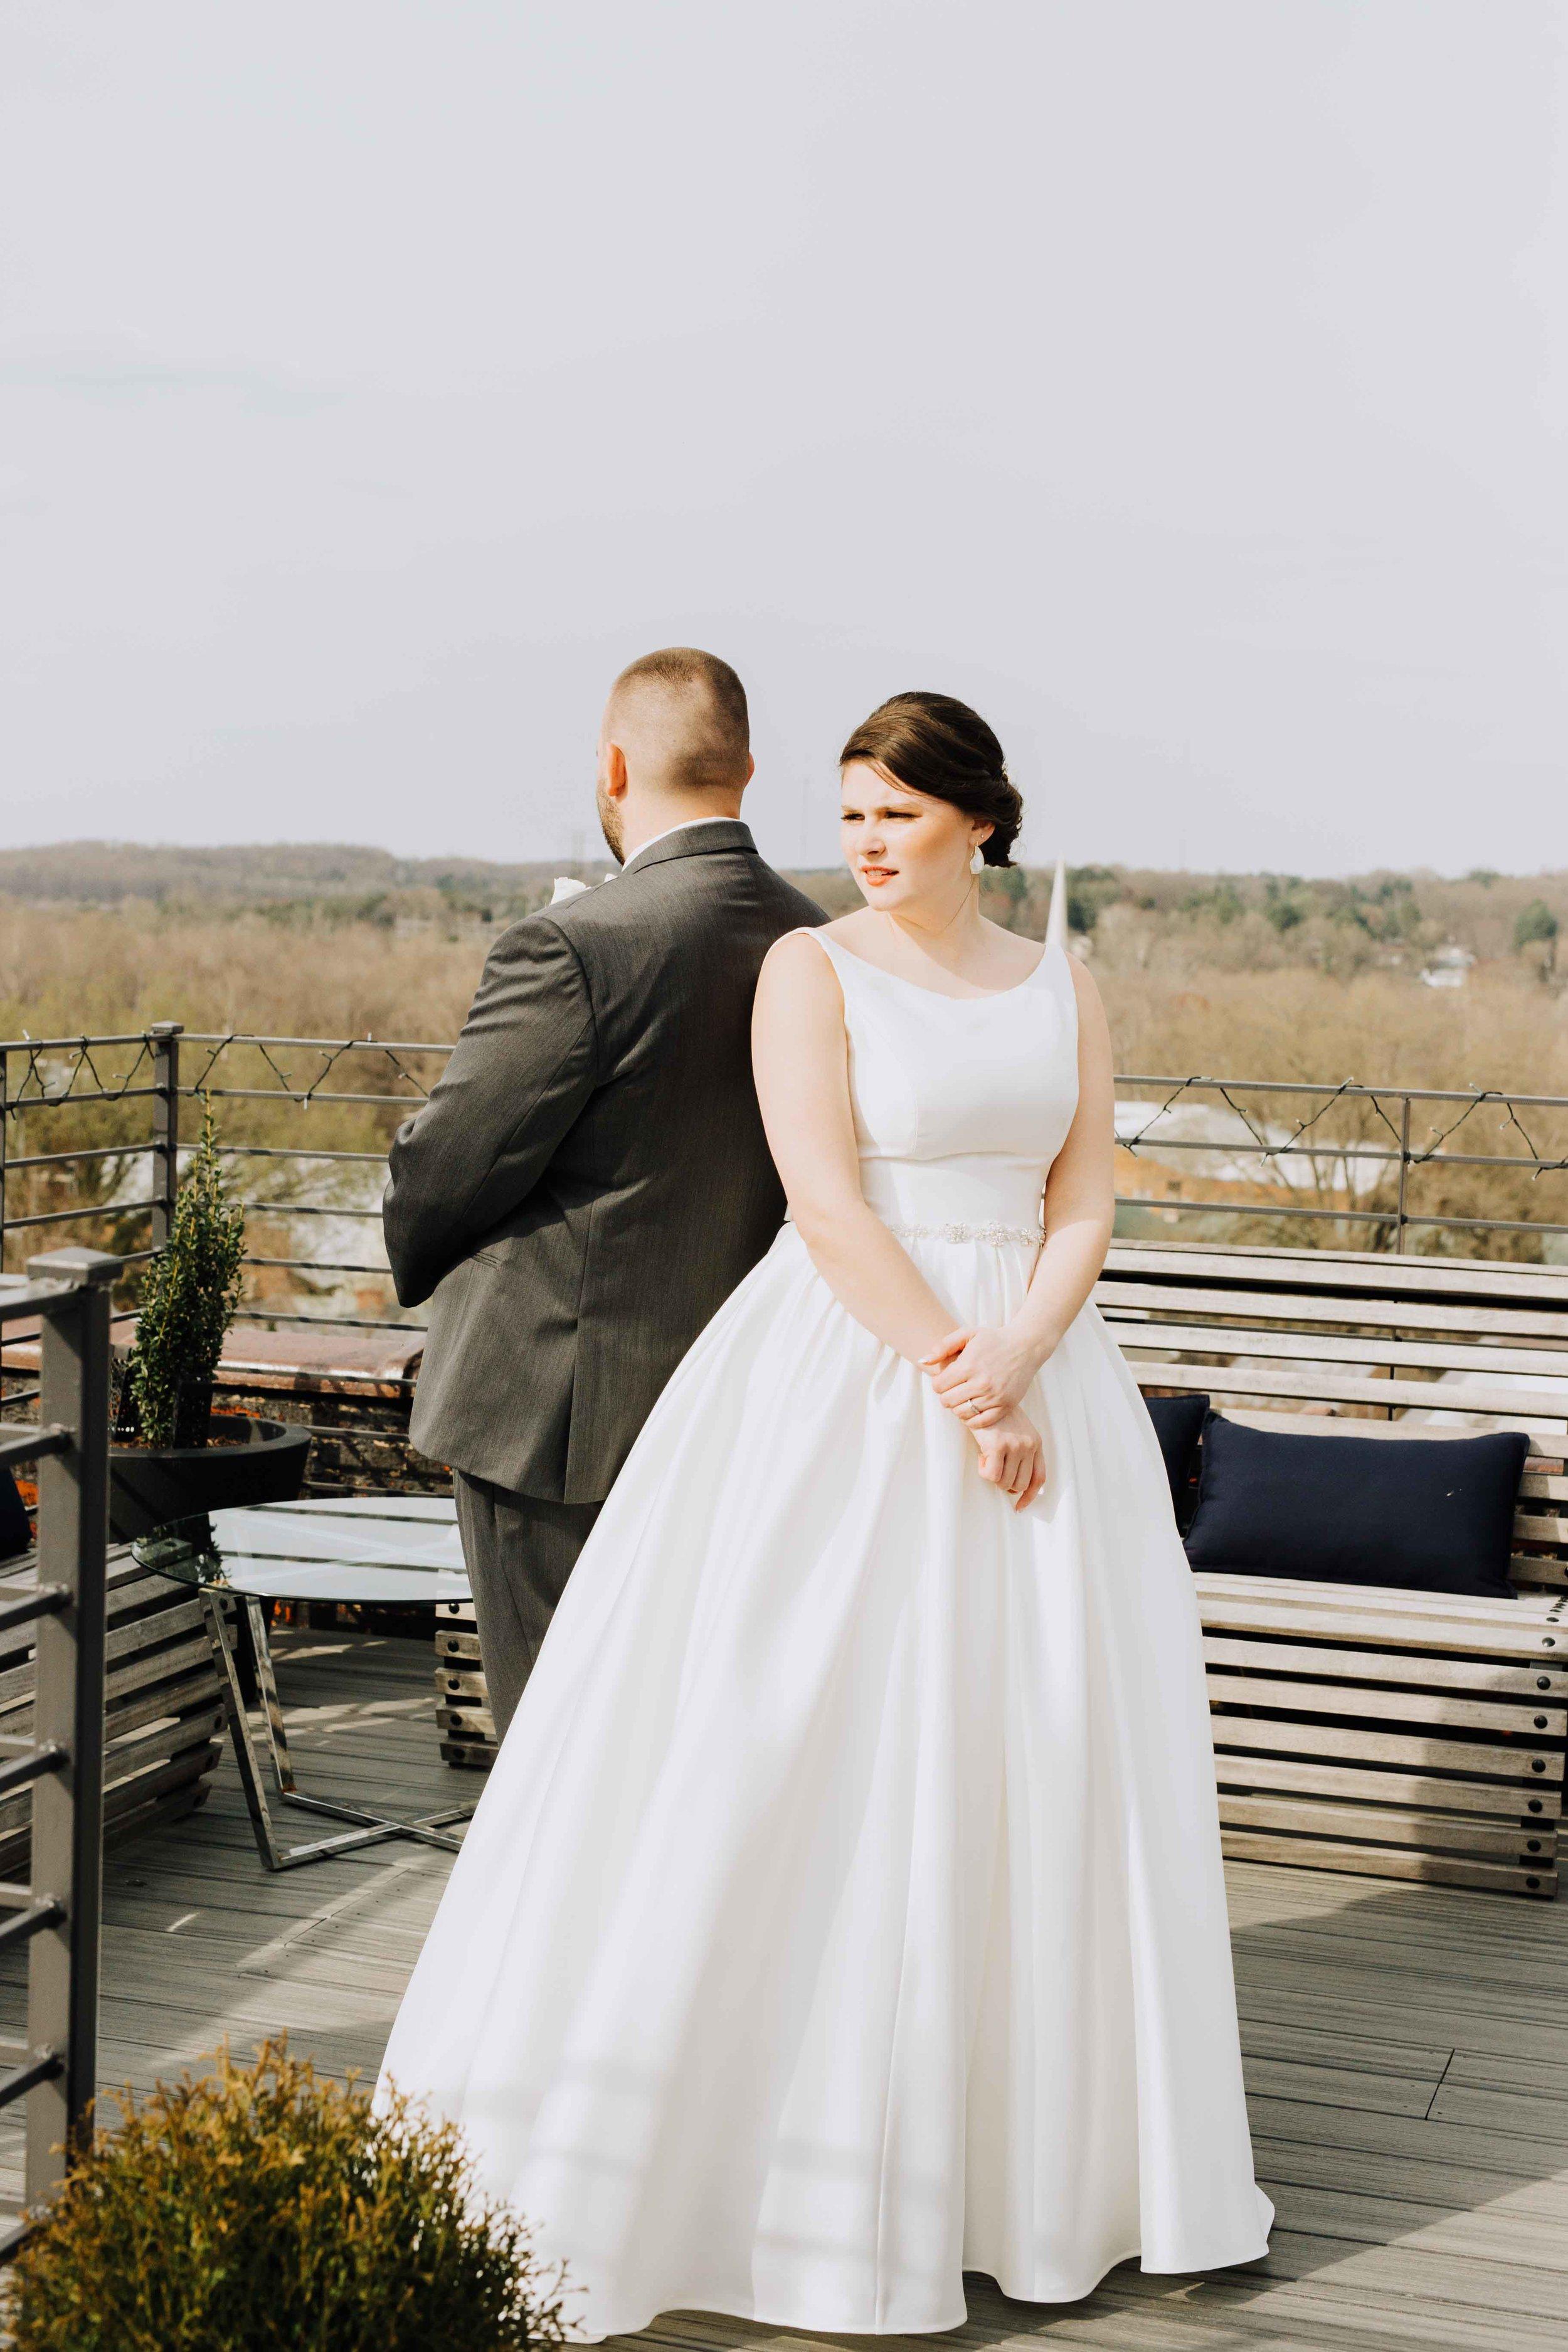 Farmville-Virginia-Wedding-Hotel-Weynoke-Downtown-Jacqueline-Waters-Photography-Detailed- (561).jpg